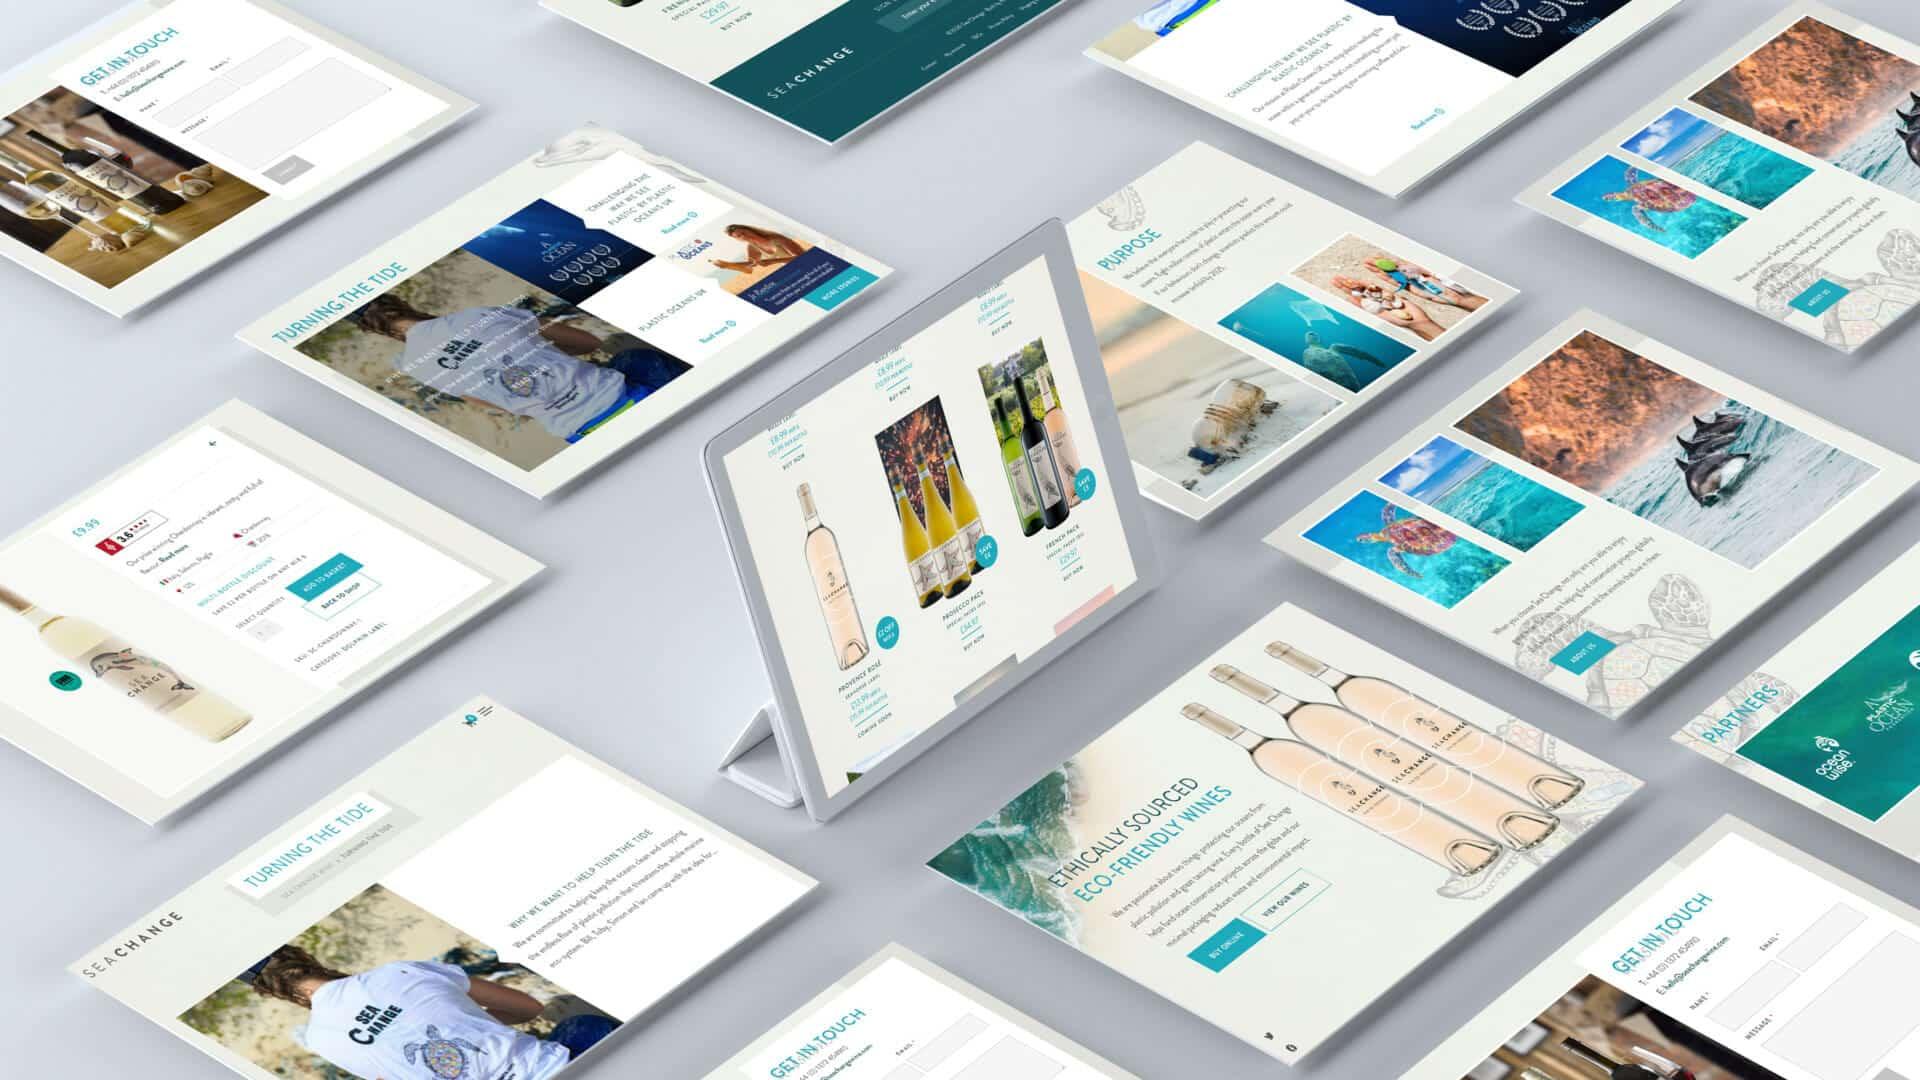 Seachange website redesign